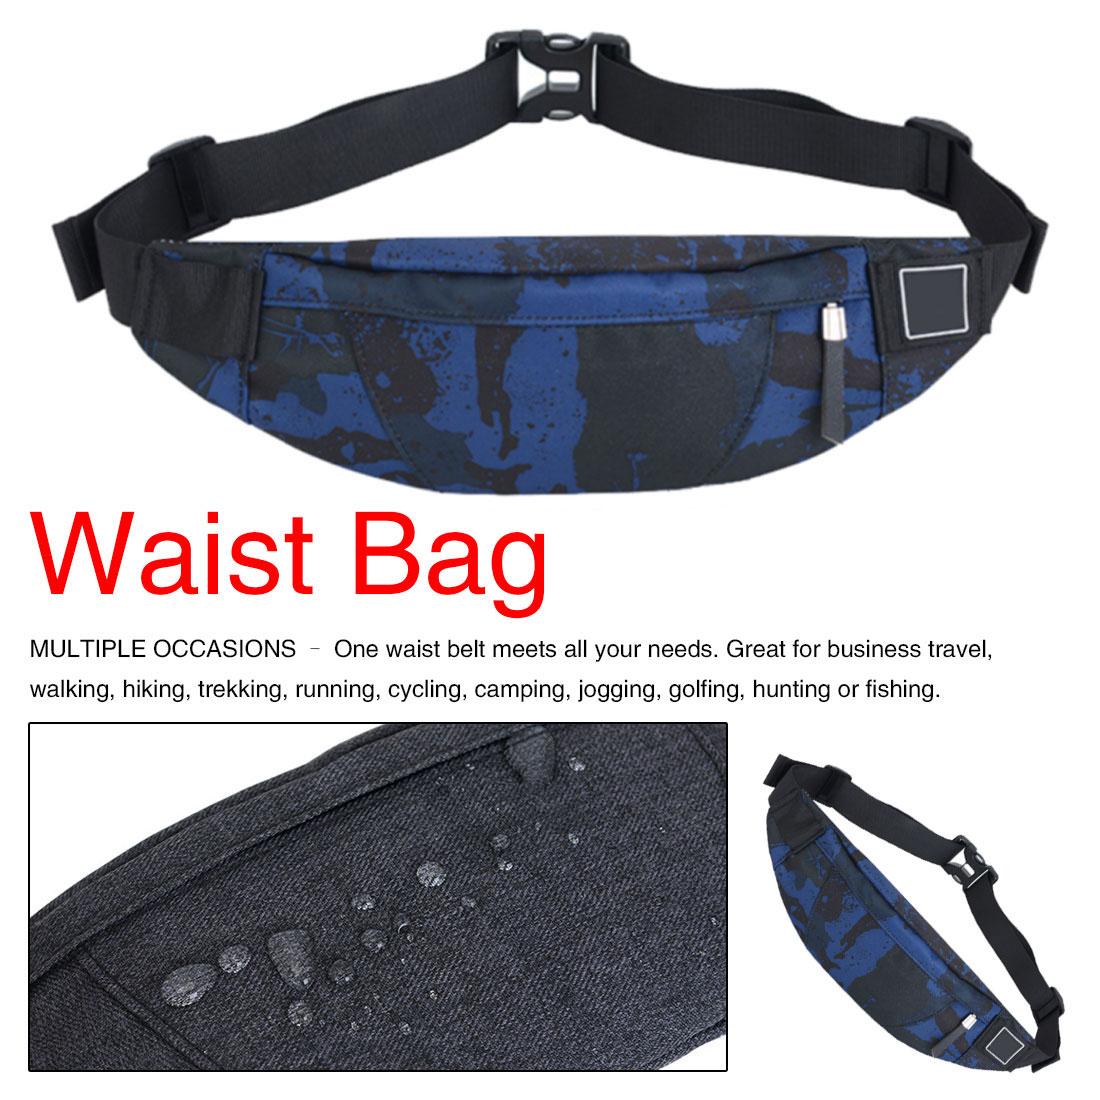 Fanny Pack Black Waterproof Money Belt Bag Men Purse Teenager's Travel Wallet Belt Male Waist Bags Cigarette Case For Phone